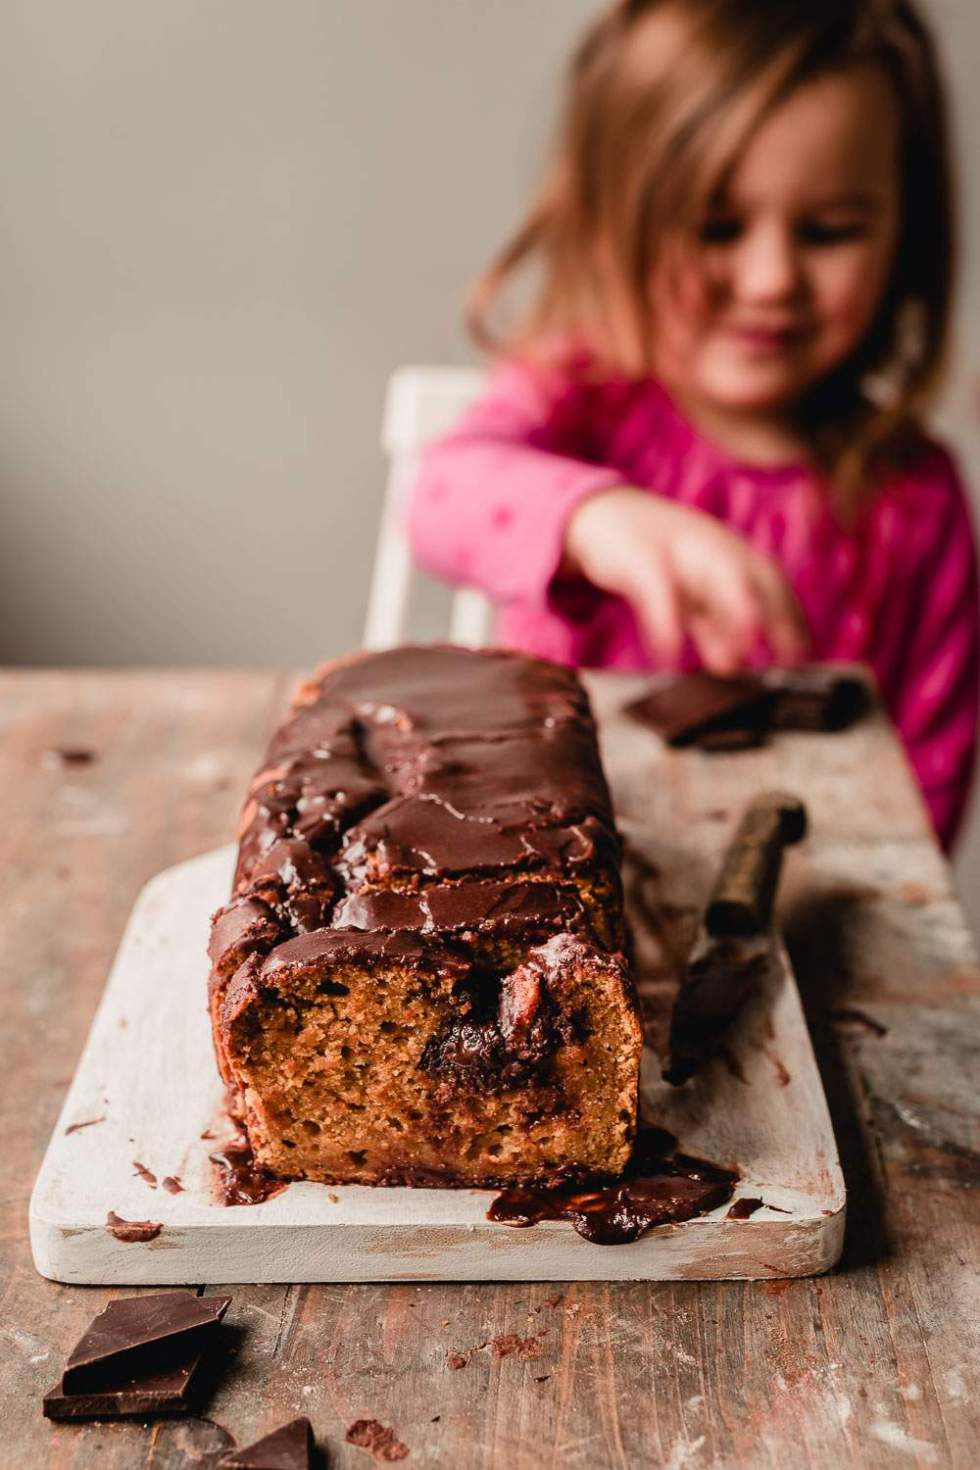 Vegan cardamom loaf cake with chocolate heart